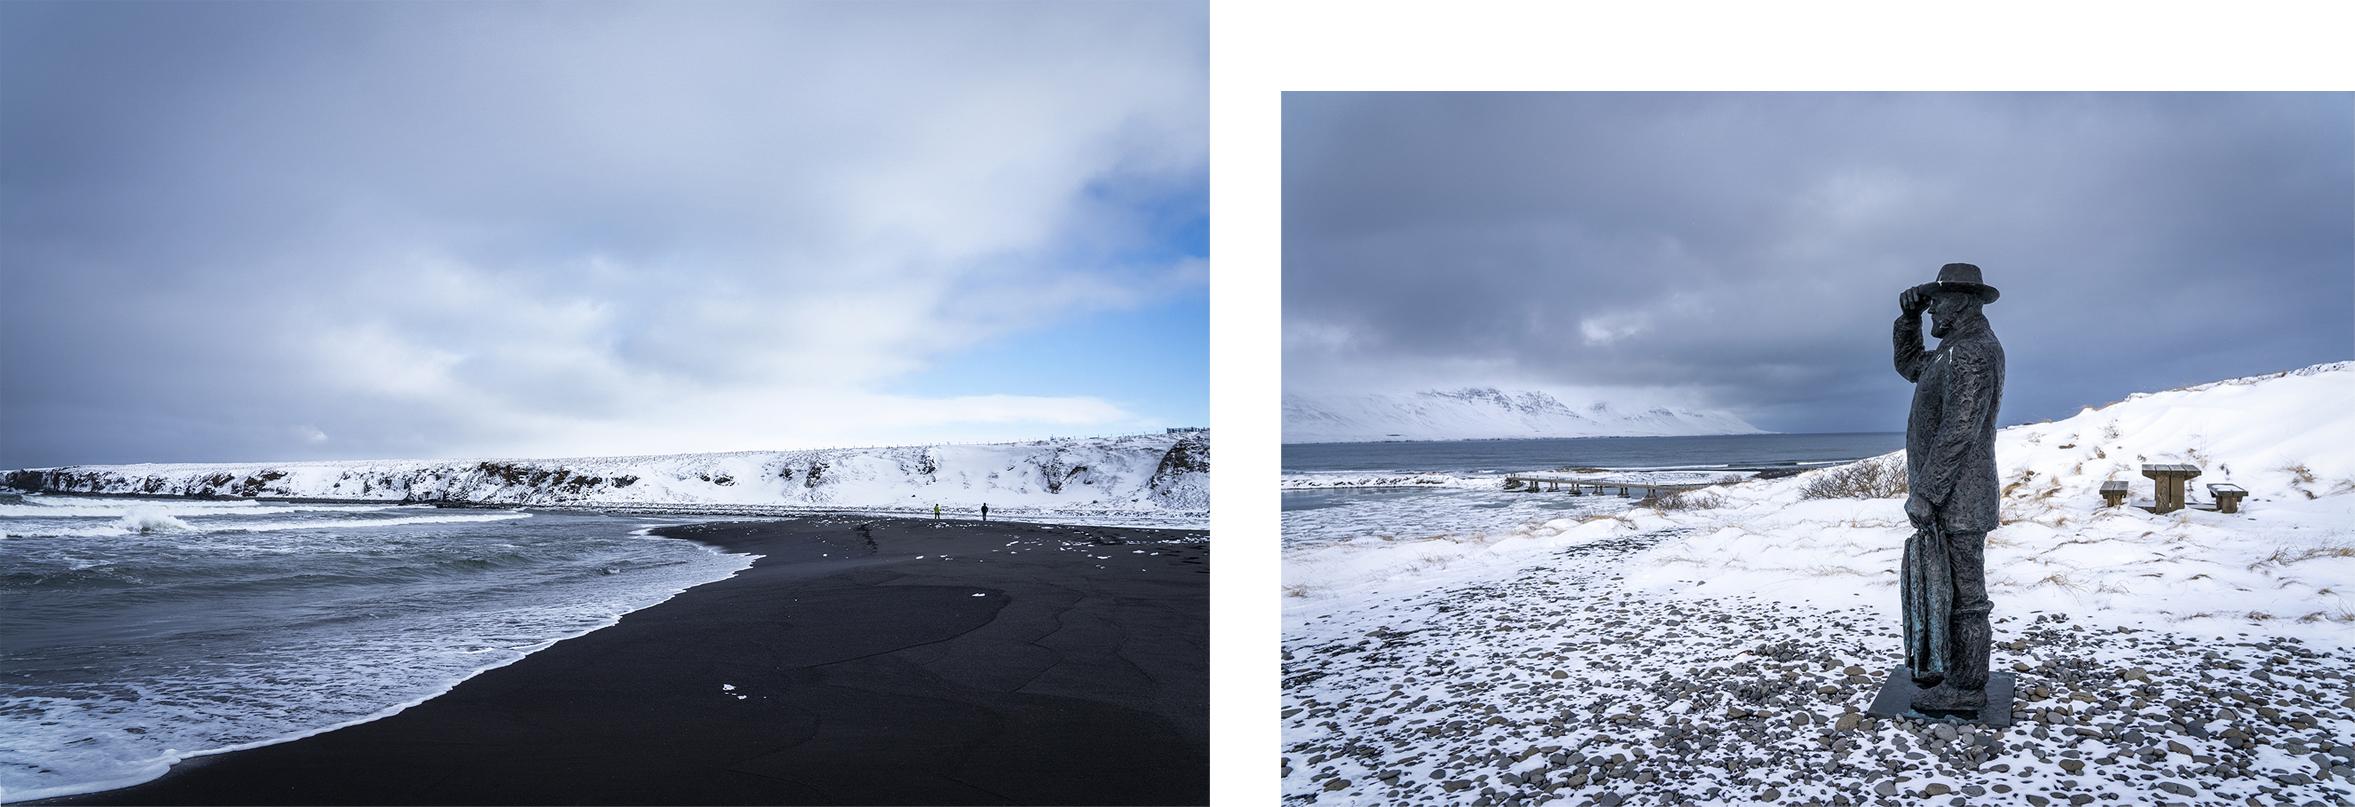 Skagafjördur plage sable noir mer écume montagnes satue